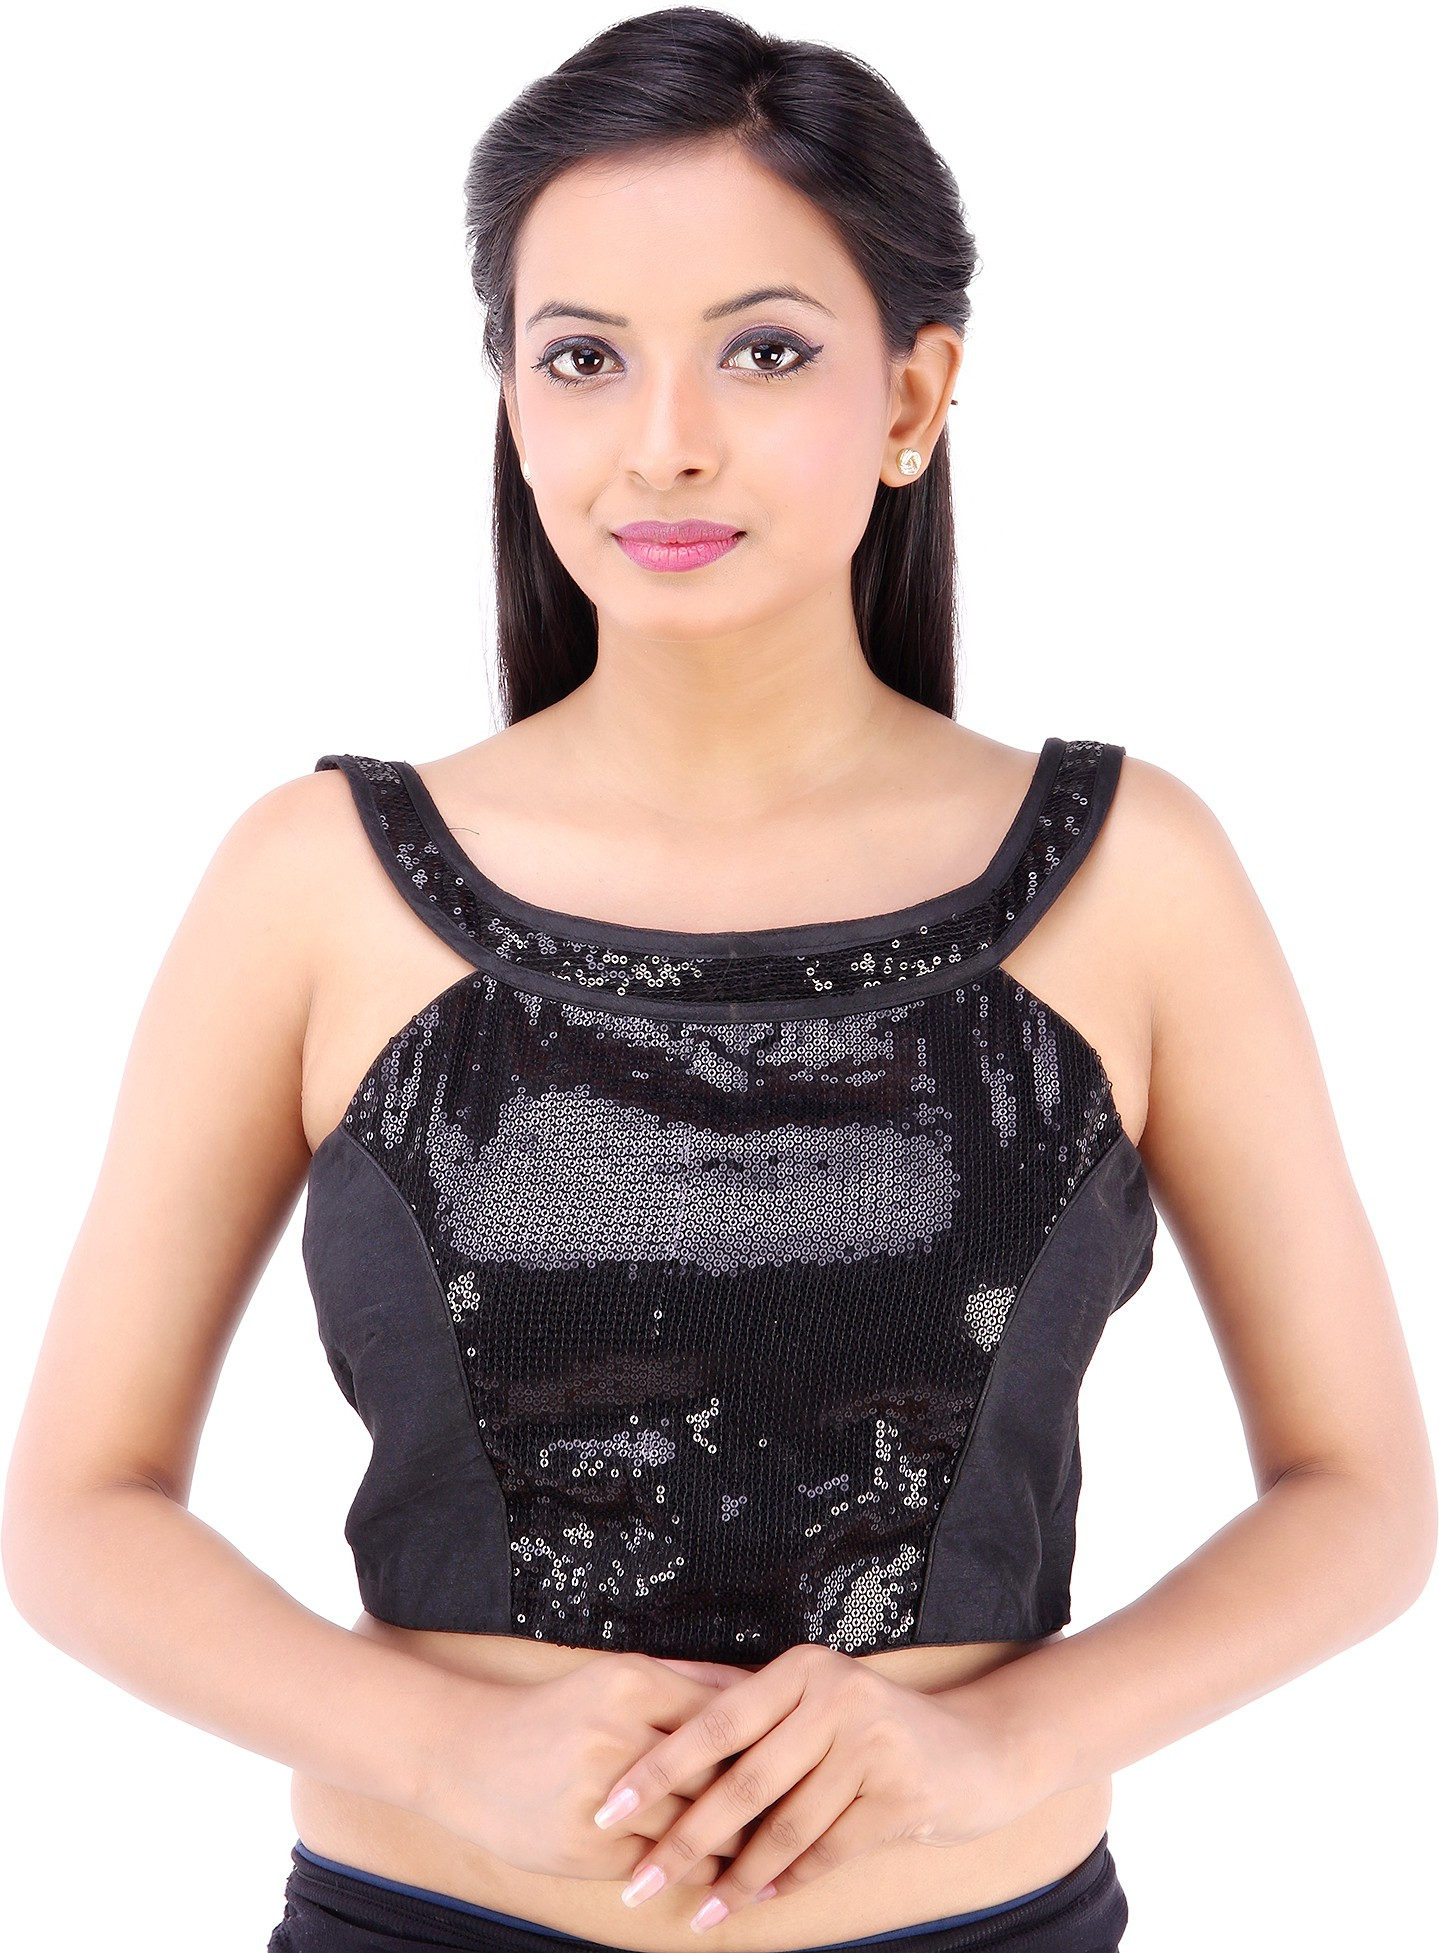 Inblue Fashions Round Neck Womens Stitched Blouse